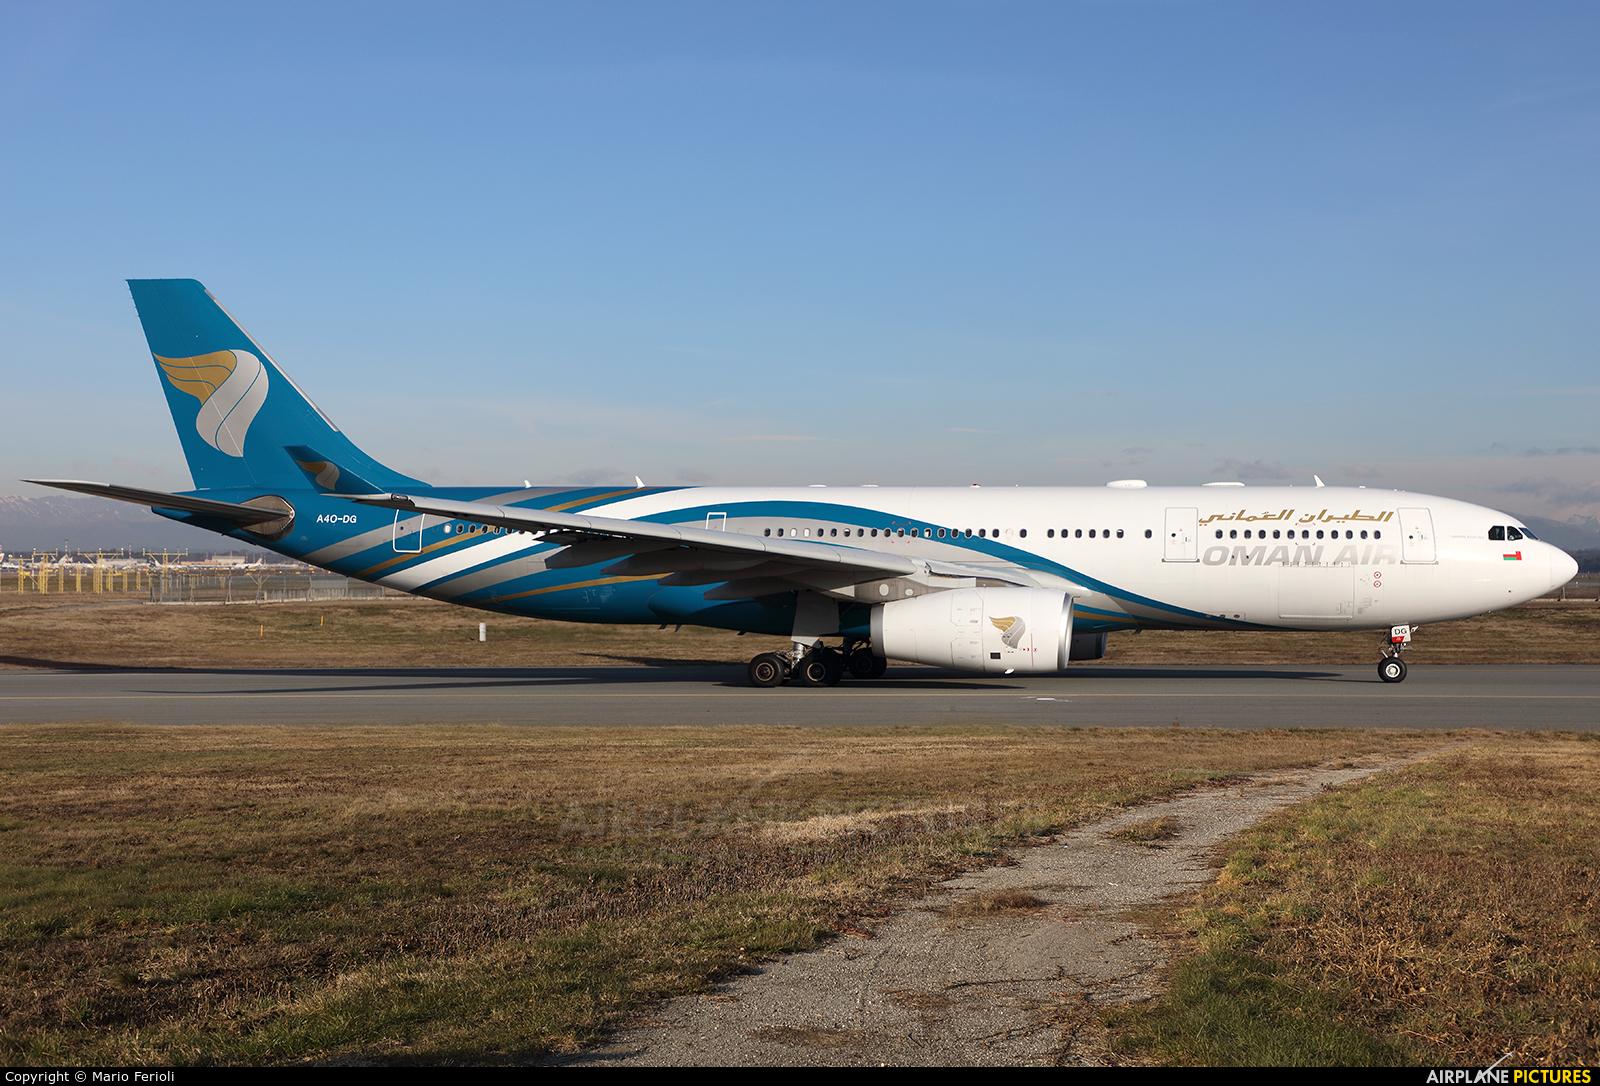 Oman Air A4O-DG aircraft at Milan - Malpensa